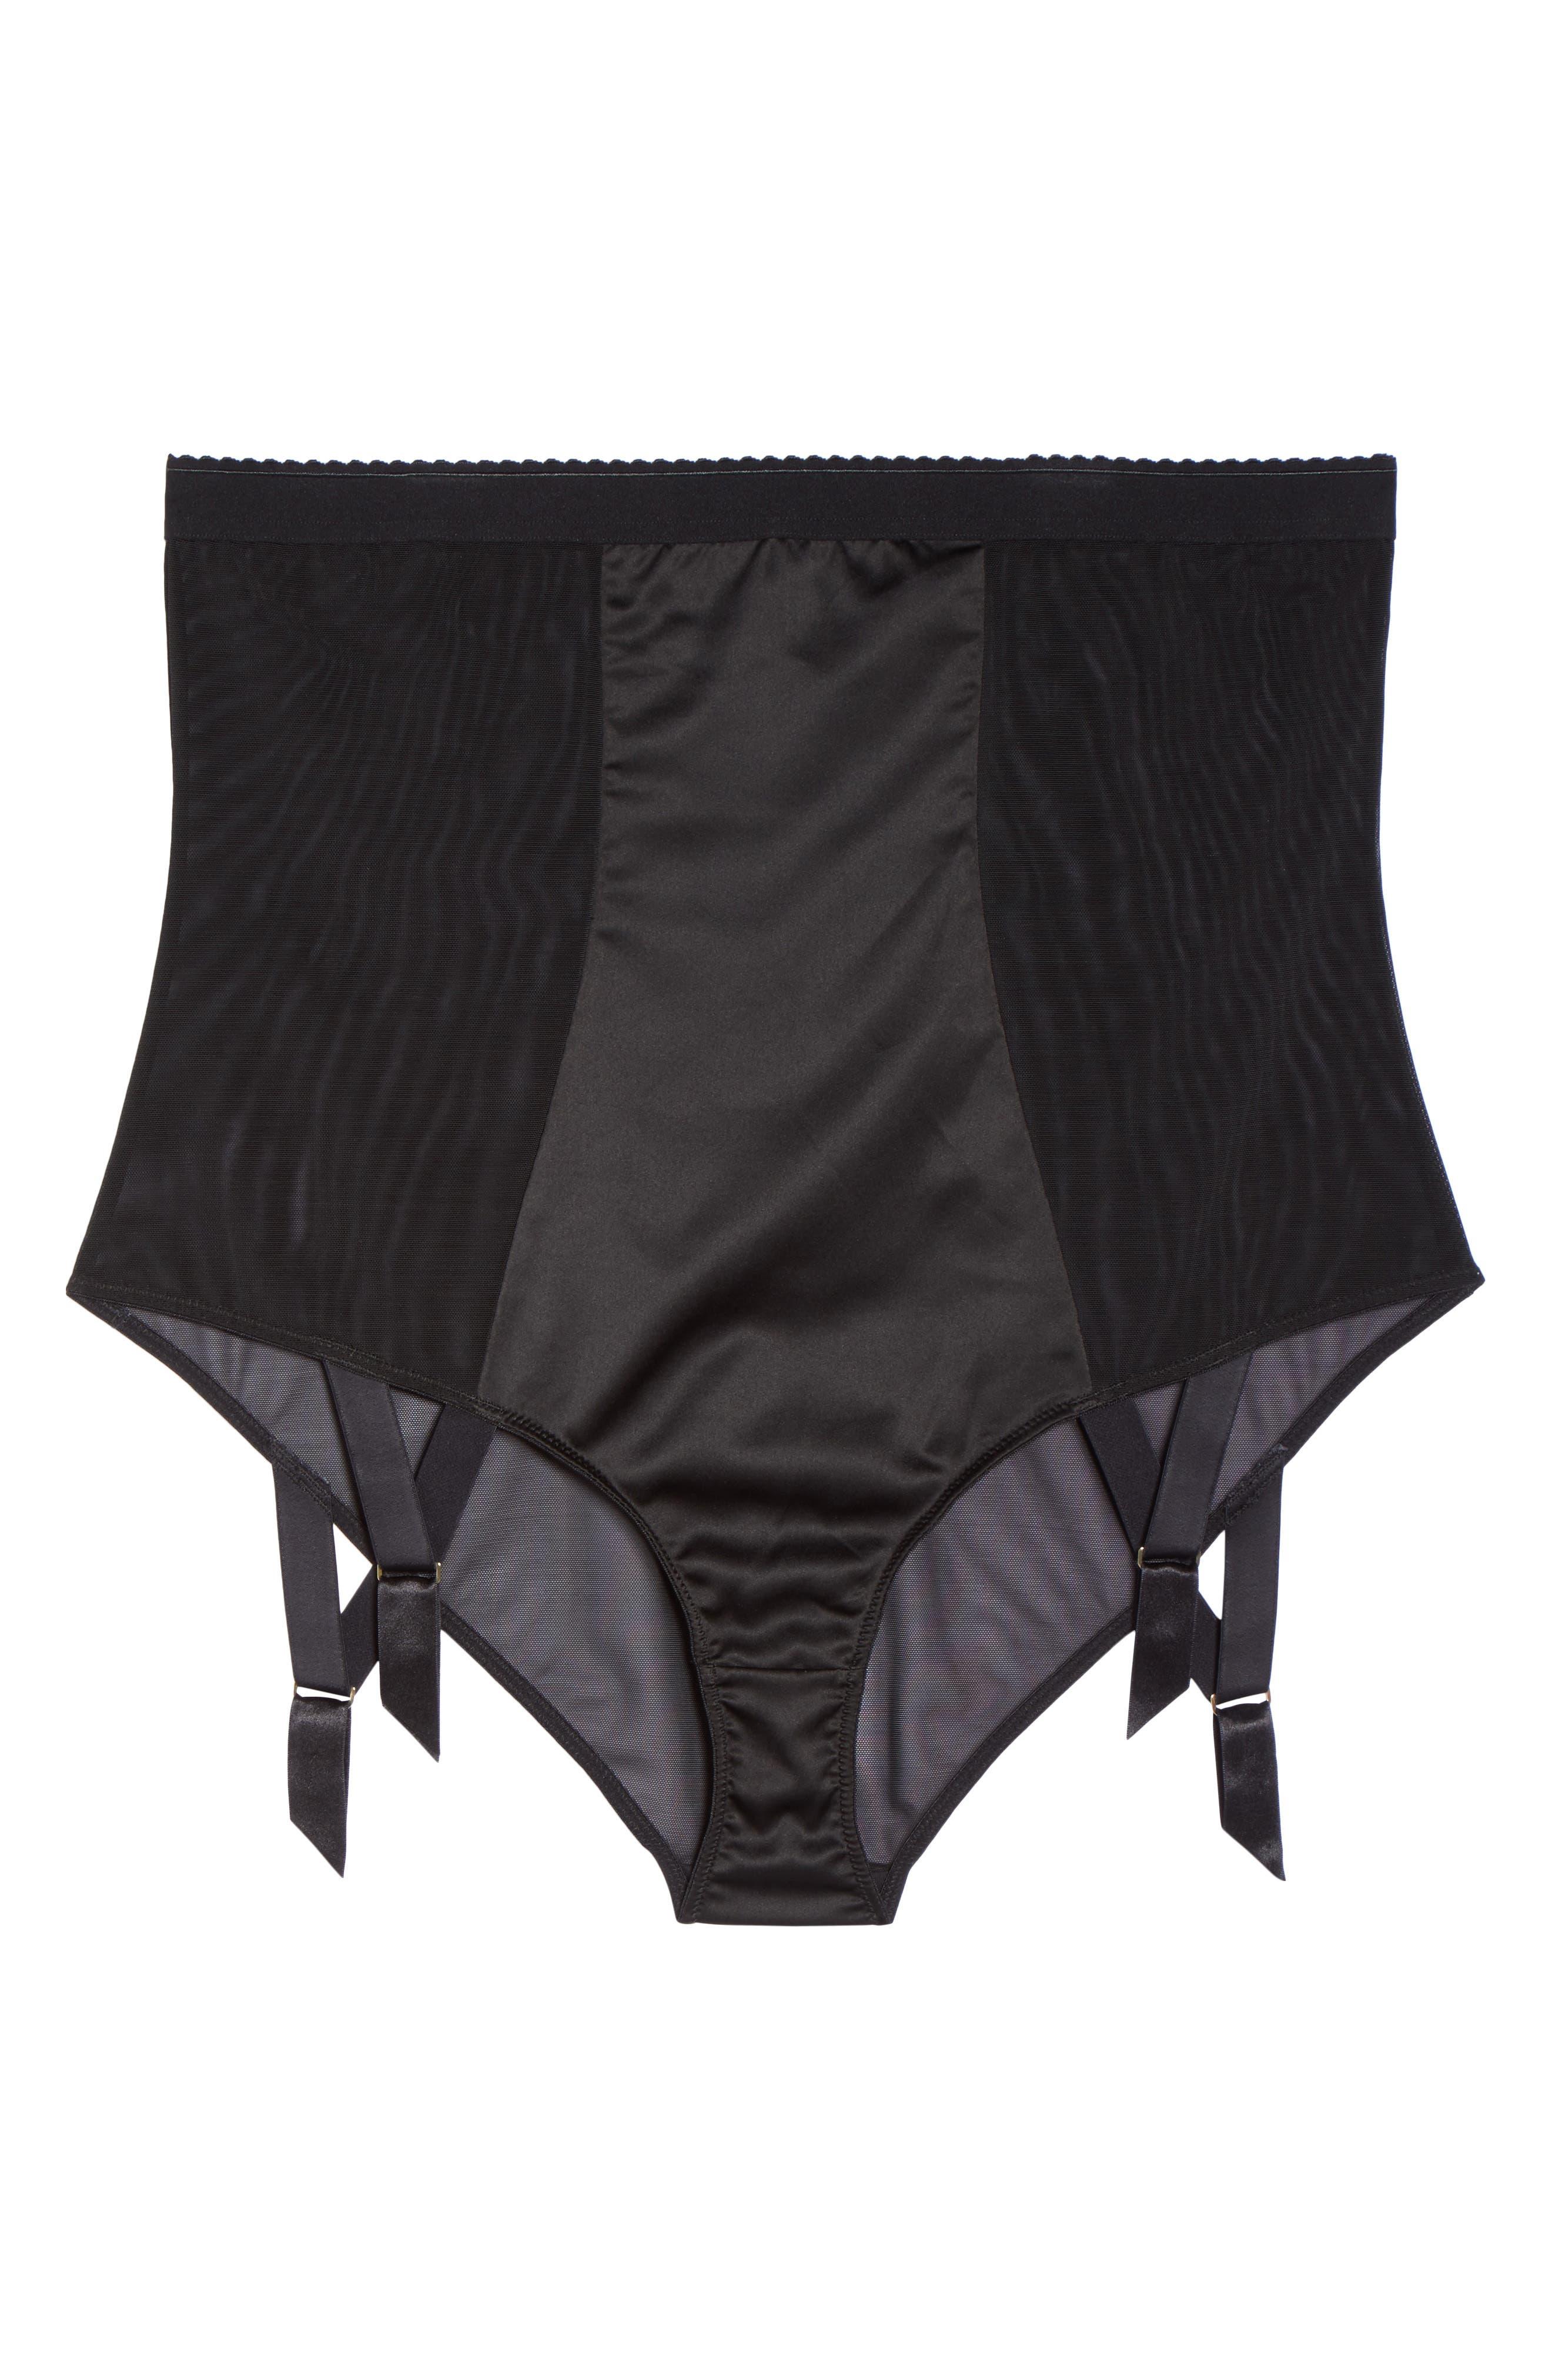 Candace Noir High Waist Panties with Garter Attachments,                             Alternate thumbnail 5, color,                             001